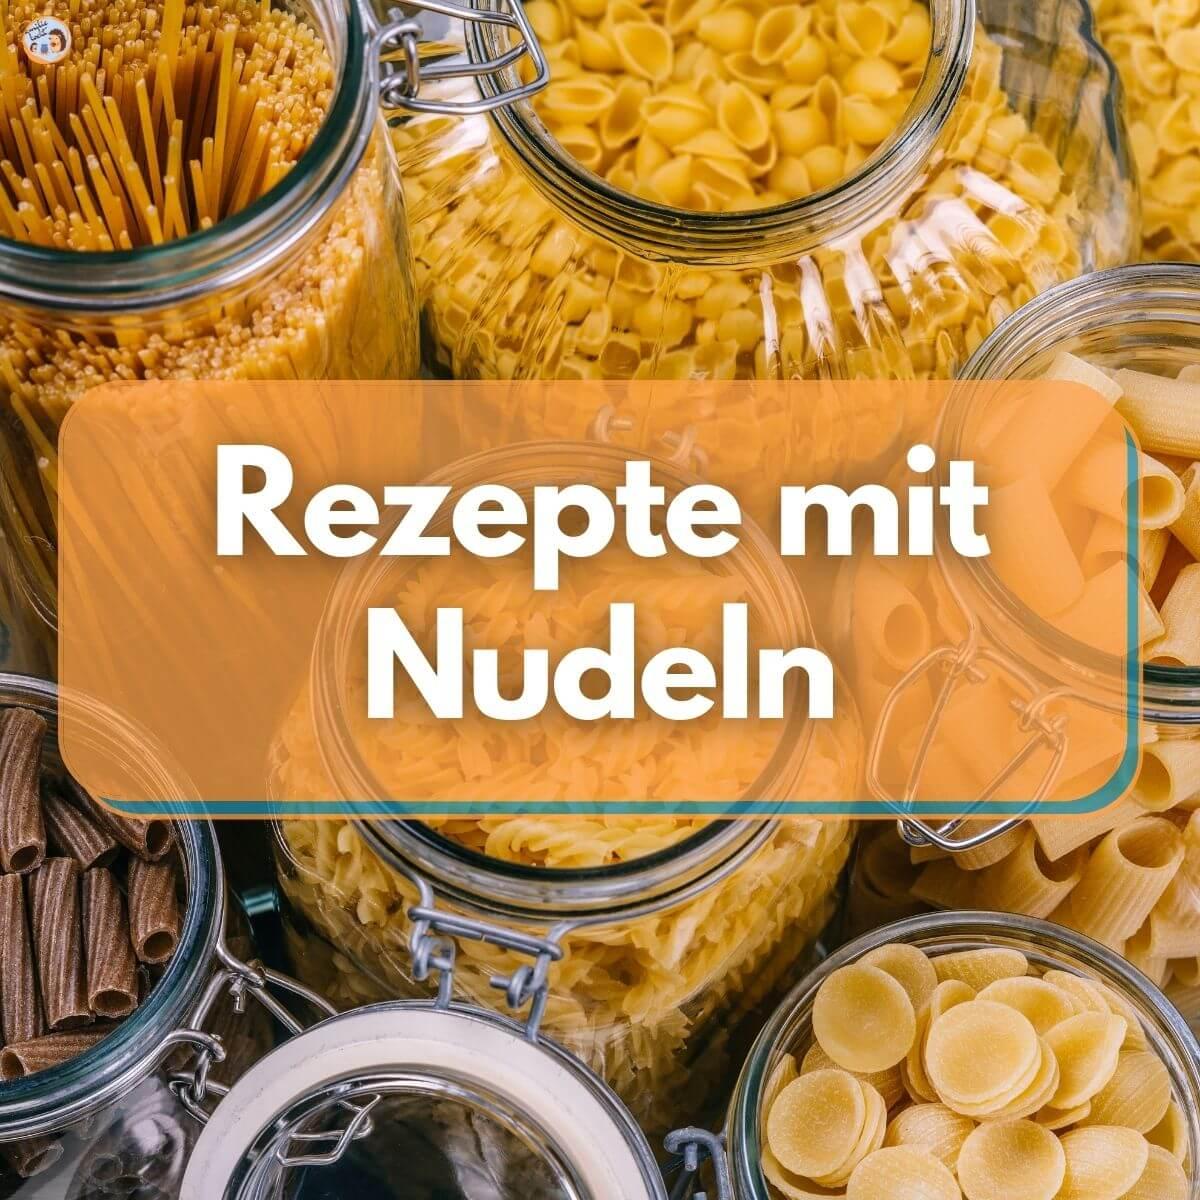 Rezepte mit Nudeln